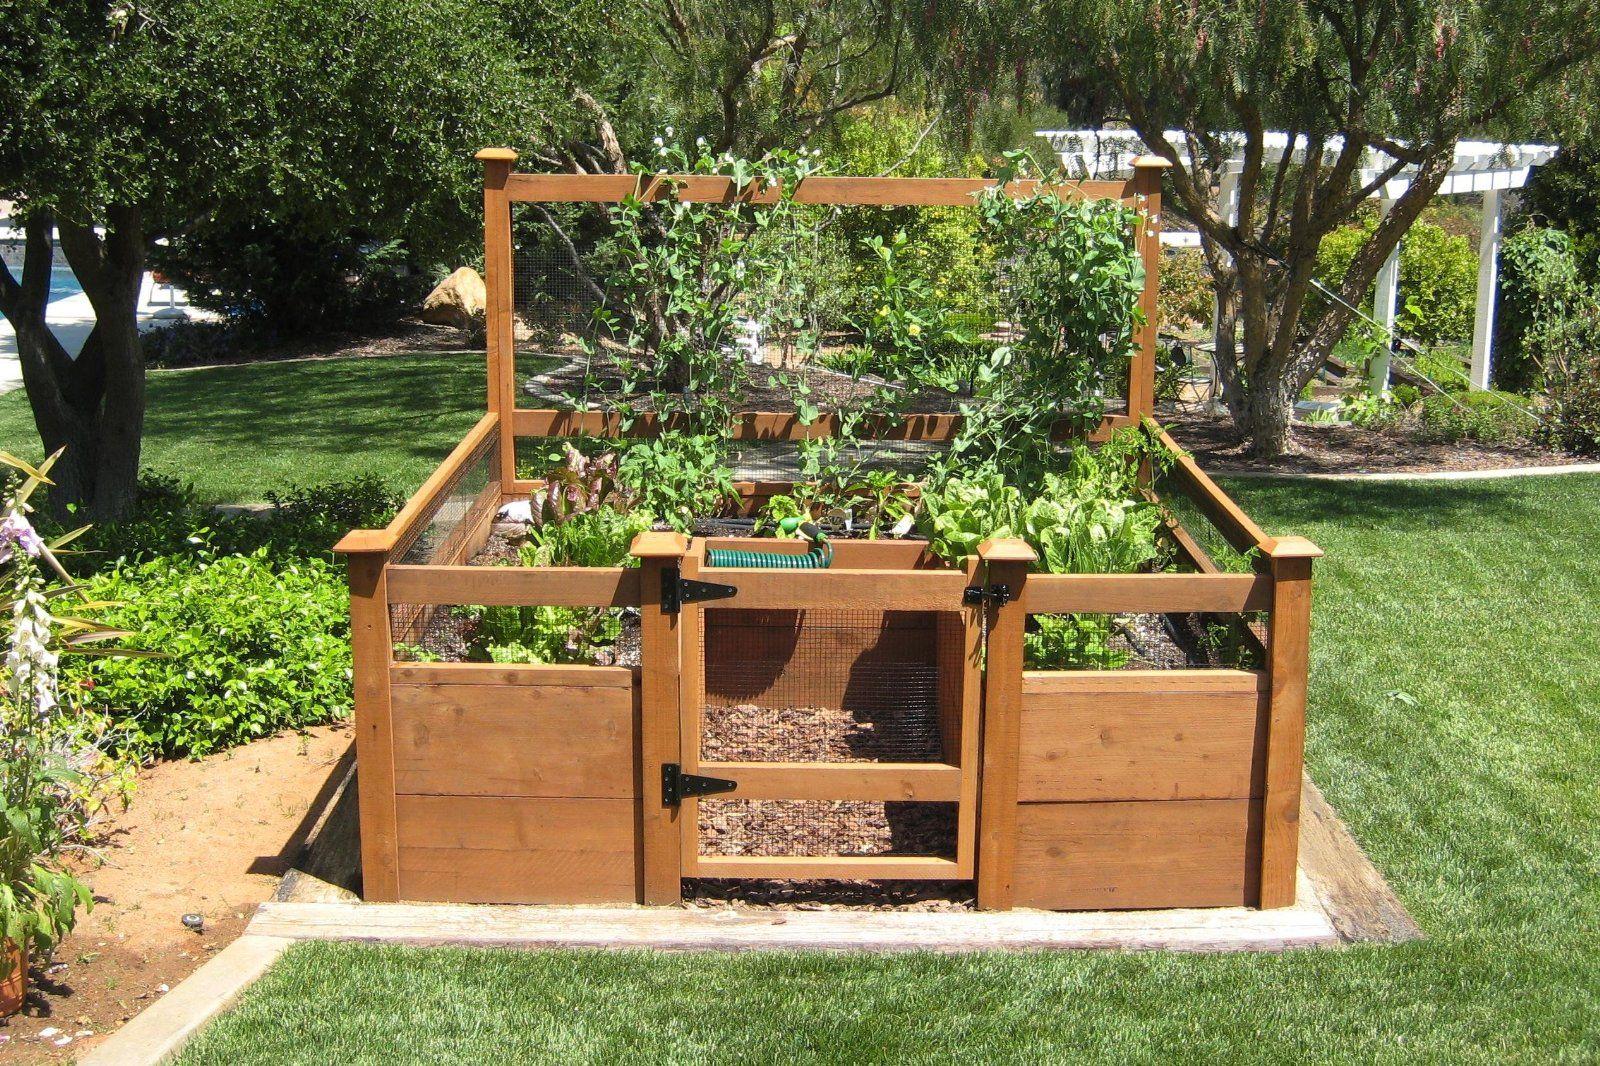 Just Add Lumber Vegetable Garden Kit - 8'x8' Deluxe:Amazon:Patio, Lawn & Garden